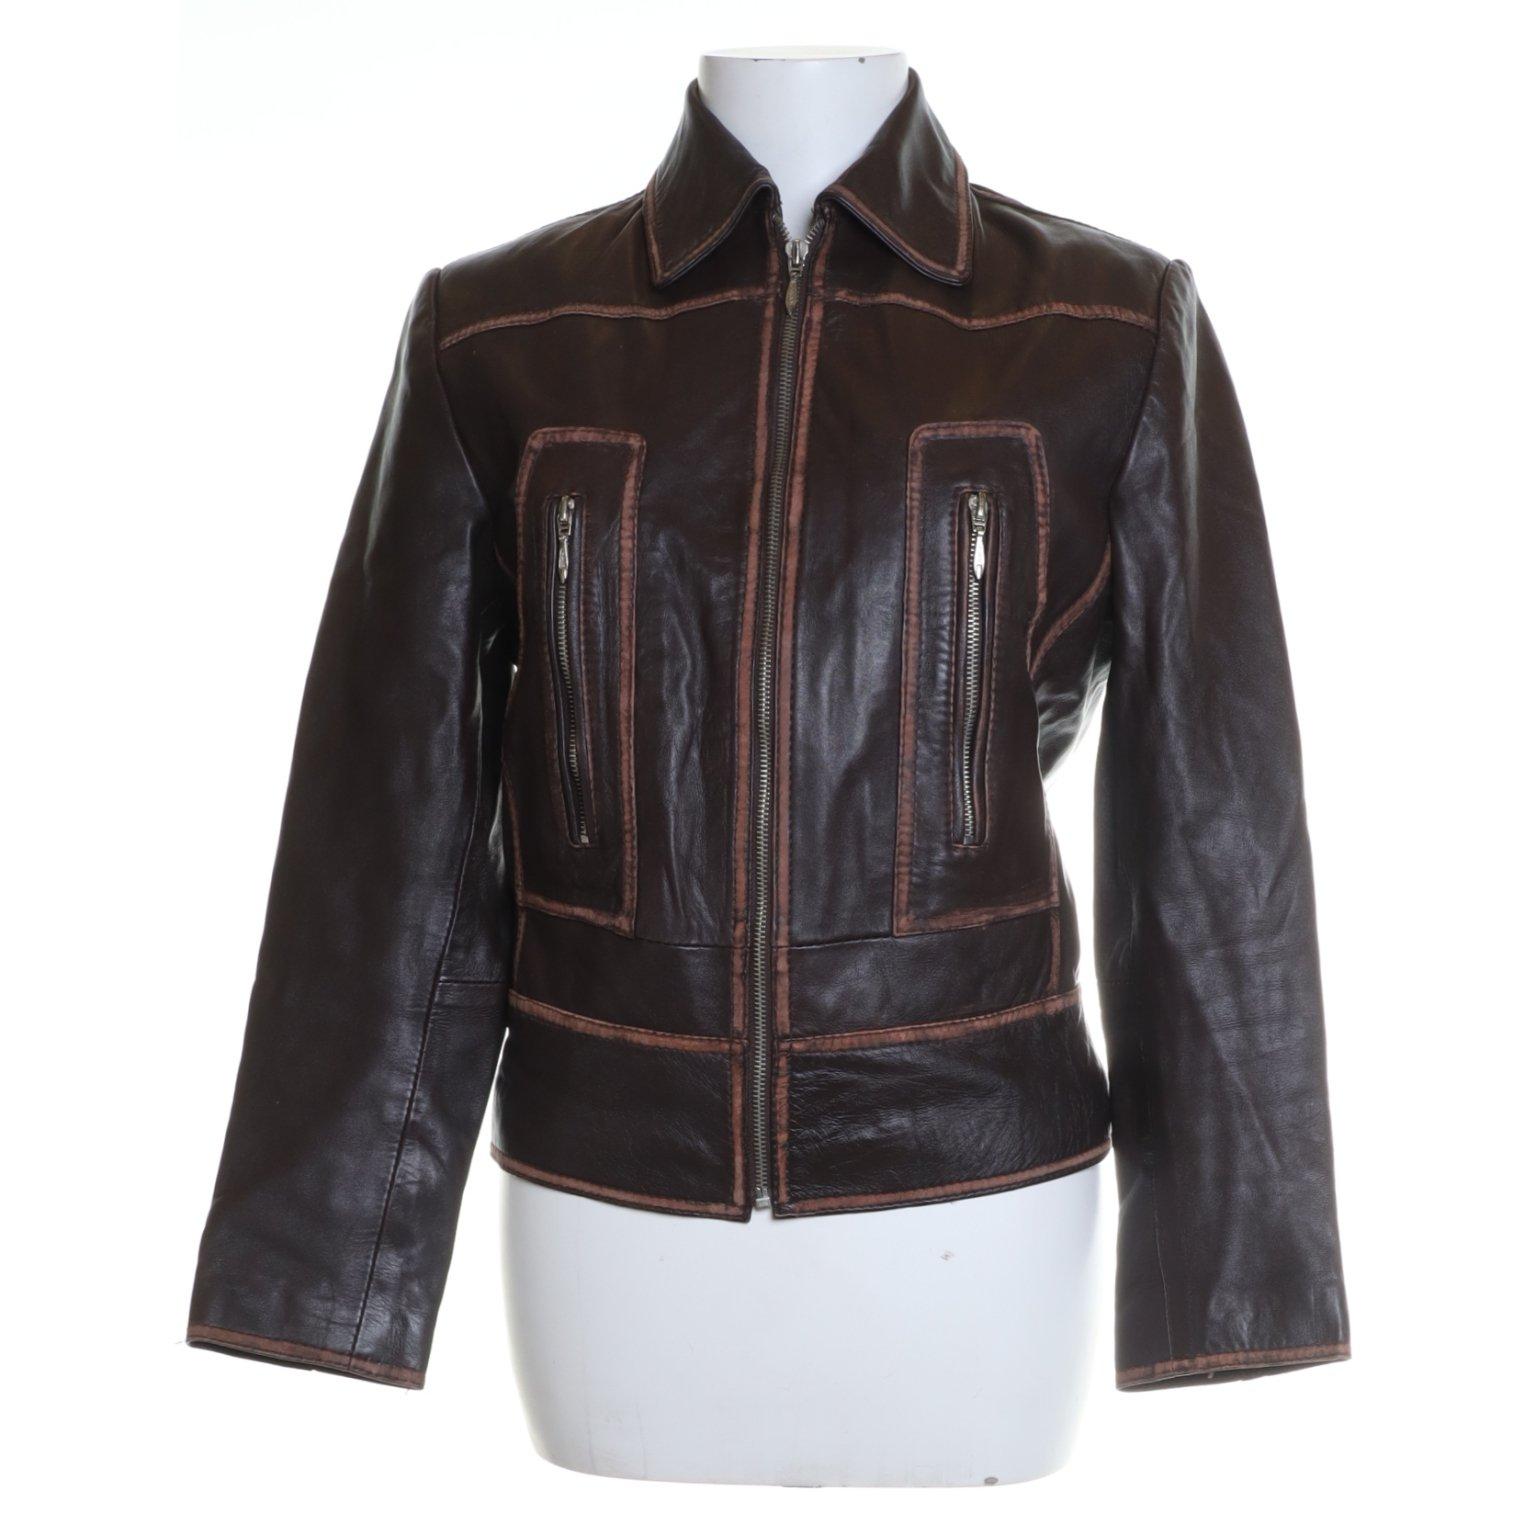 Heeli Exclusive Collection, Skinnjacka, S.. (415587794) ᐈ